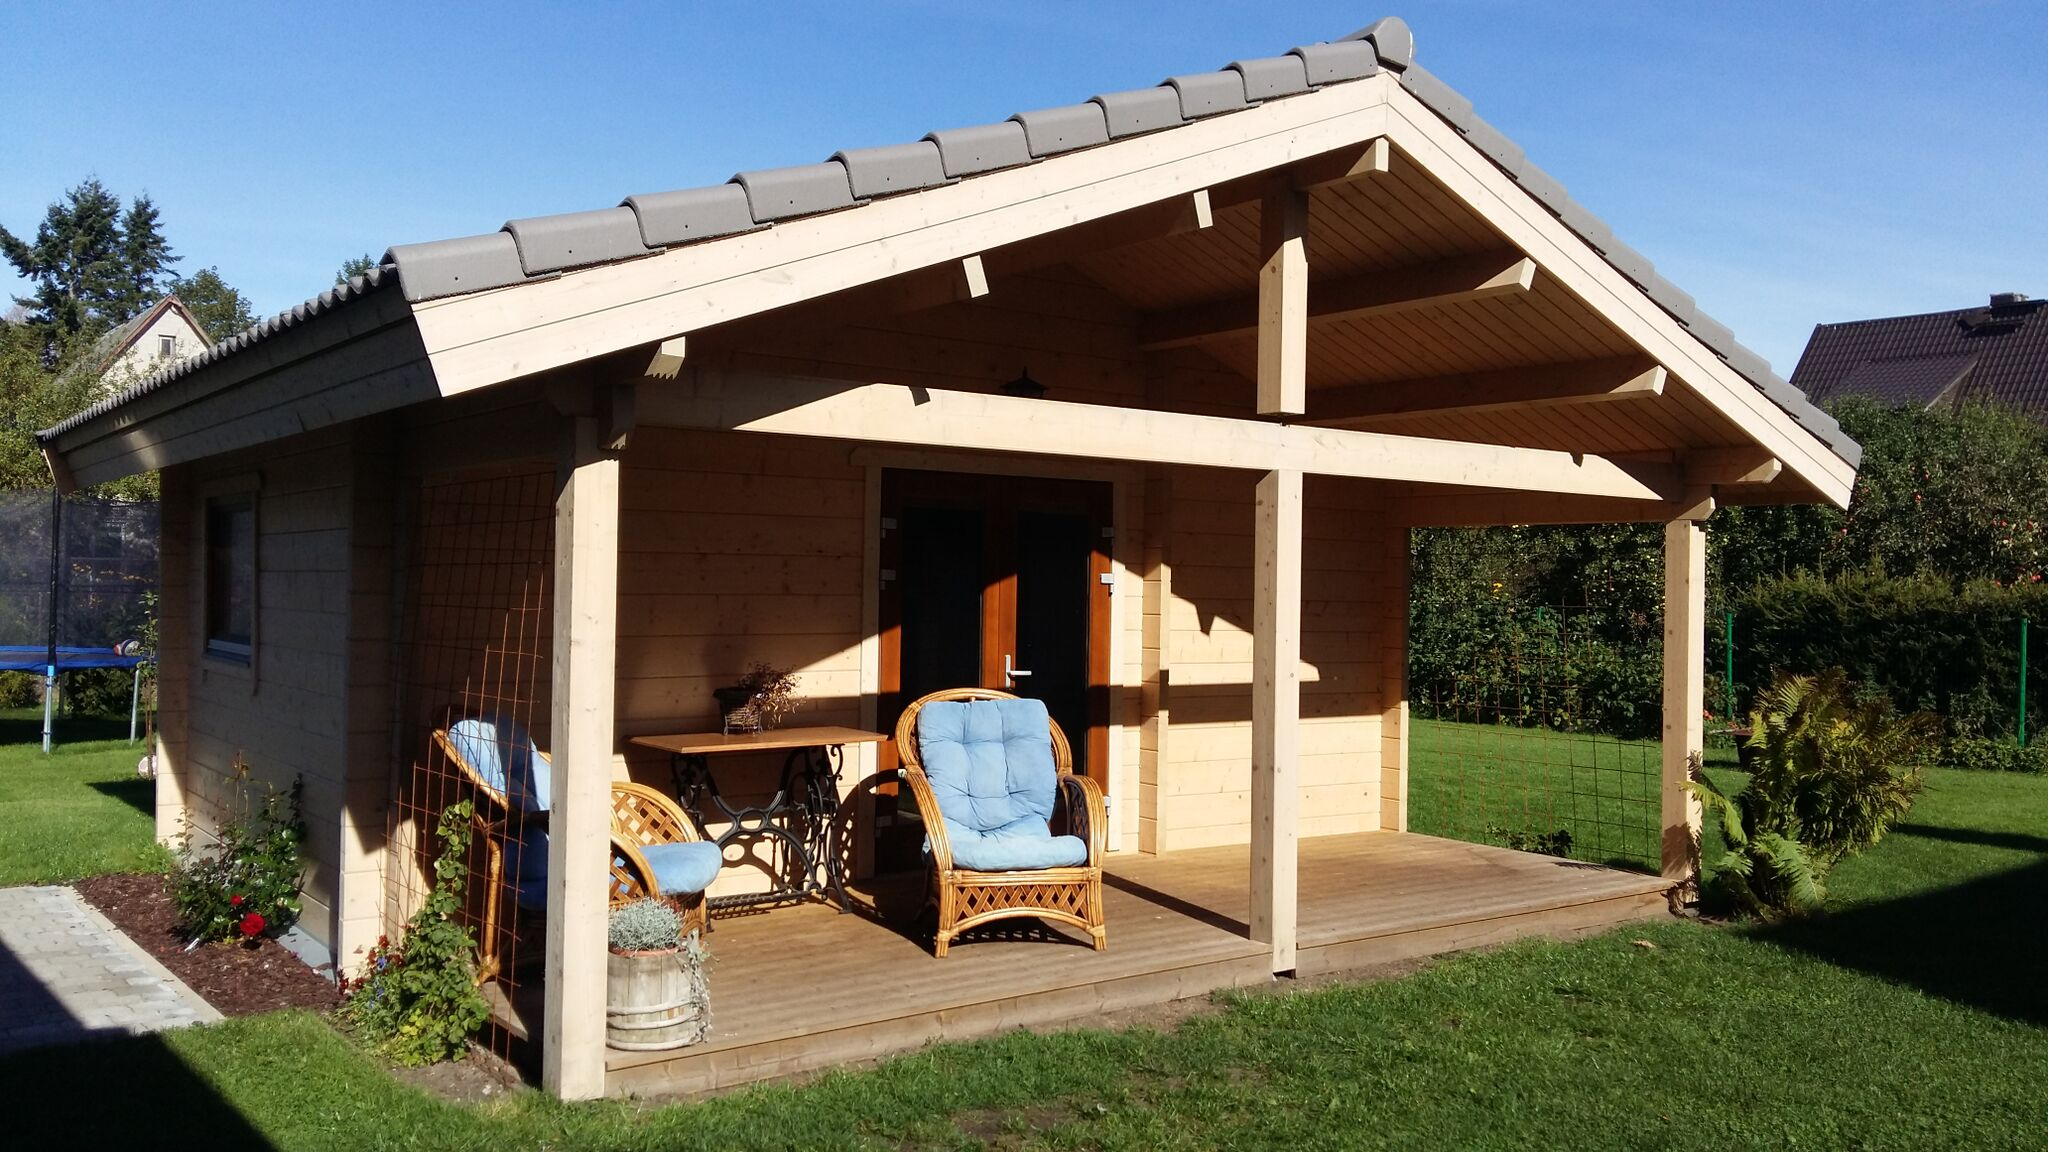 gartenhaus mit sauna hapo b70 jphouses. Black Bedroom Furniture Sets. Home Design Ideas